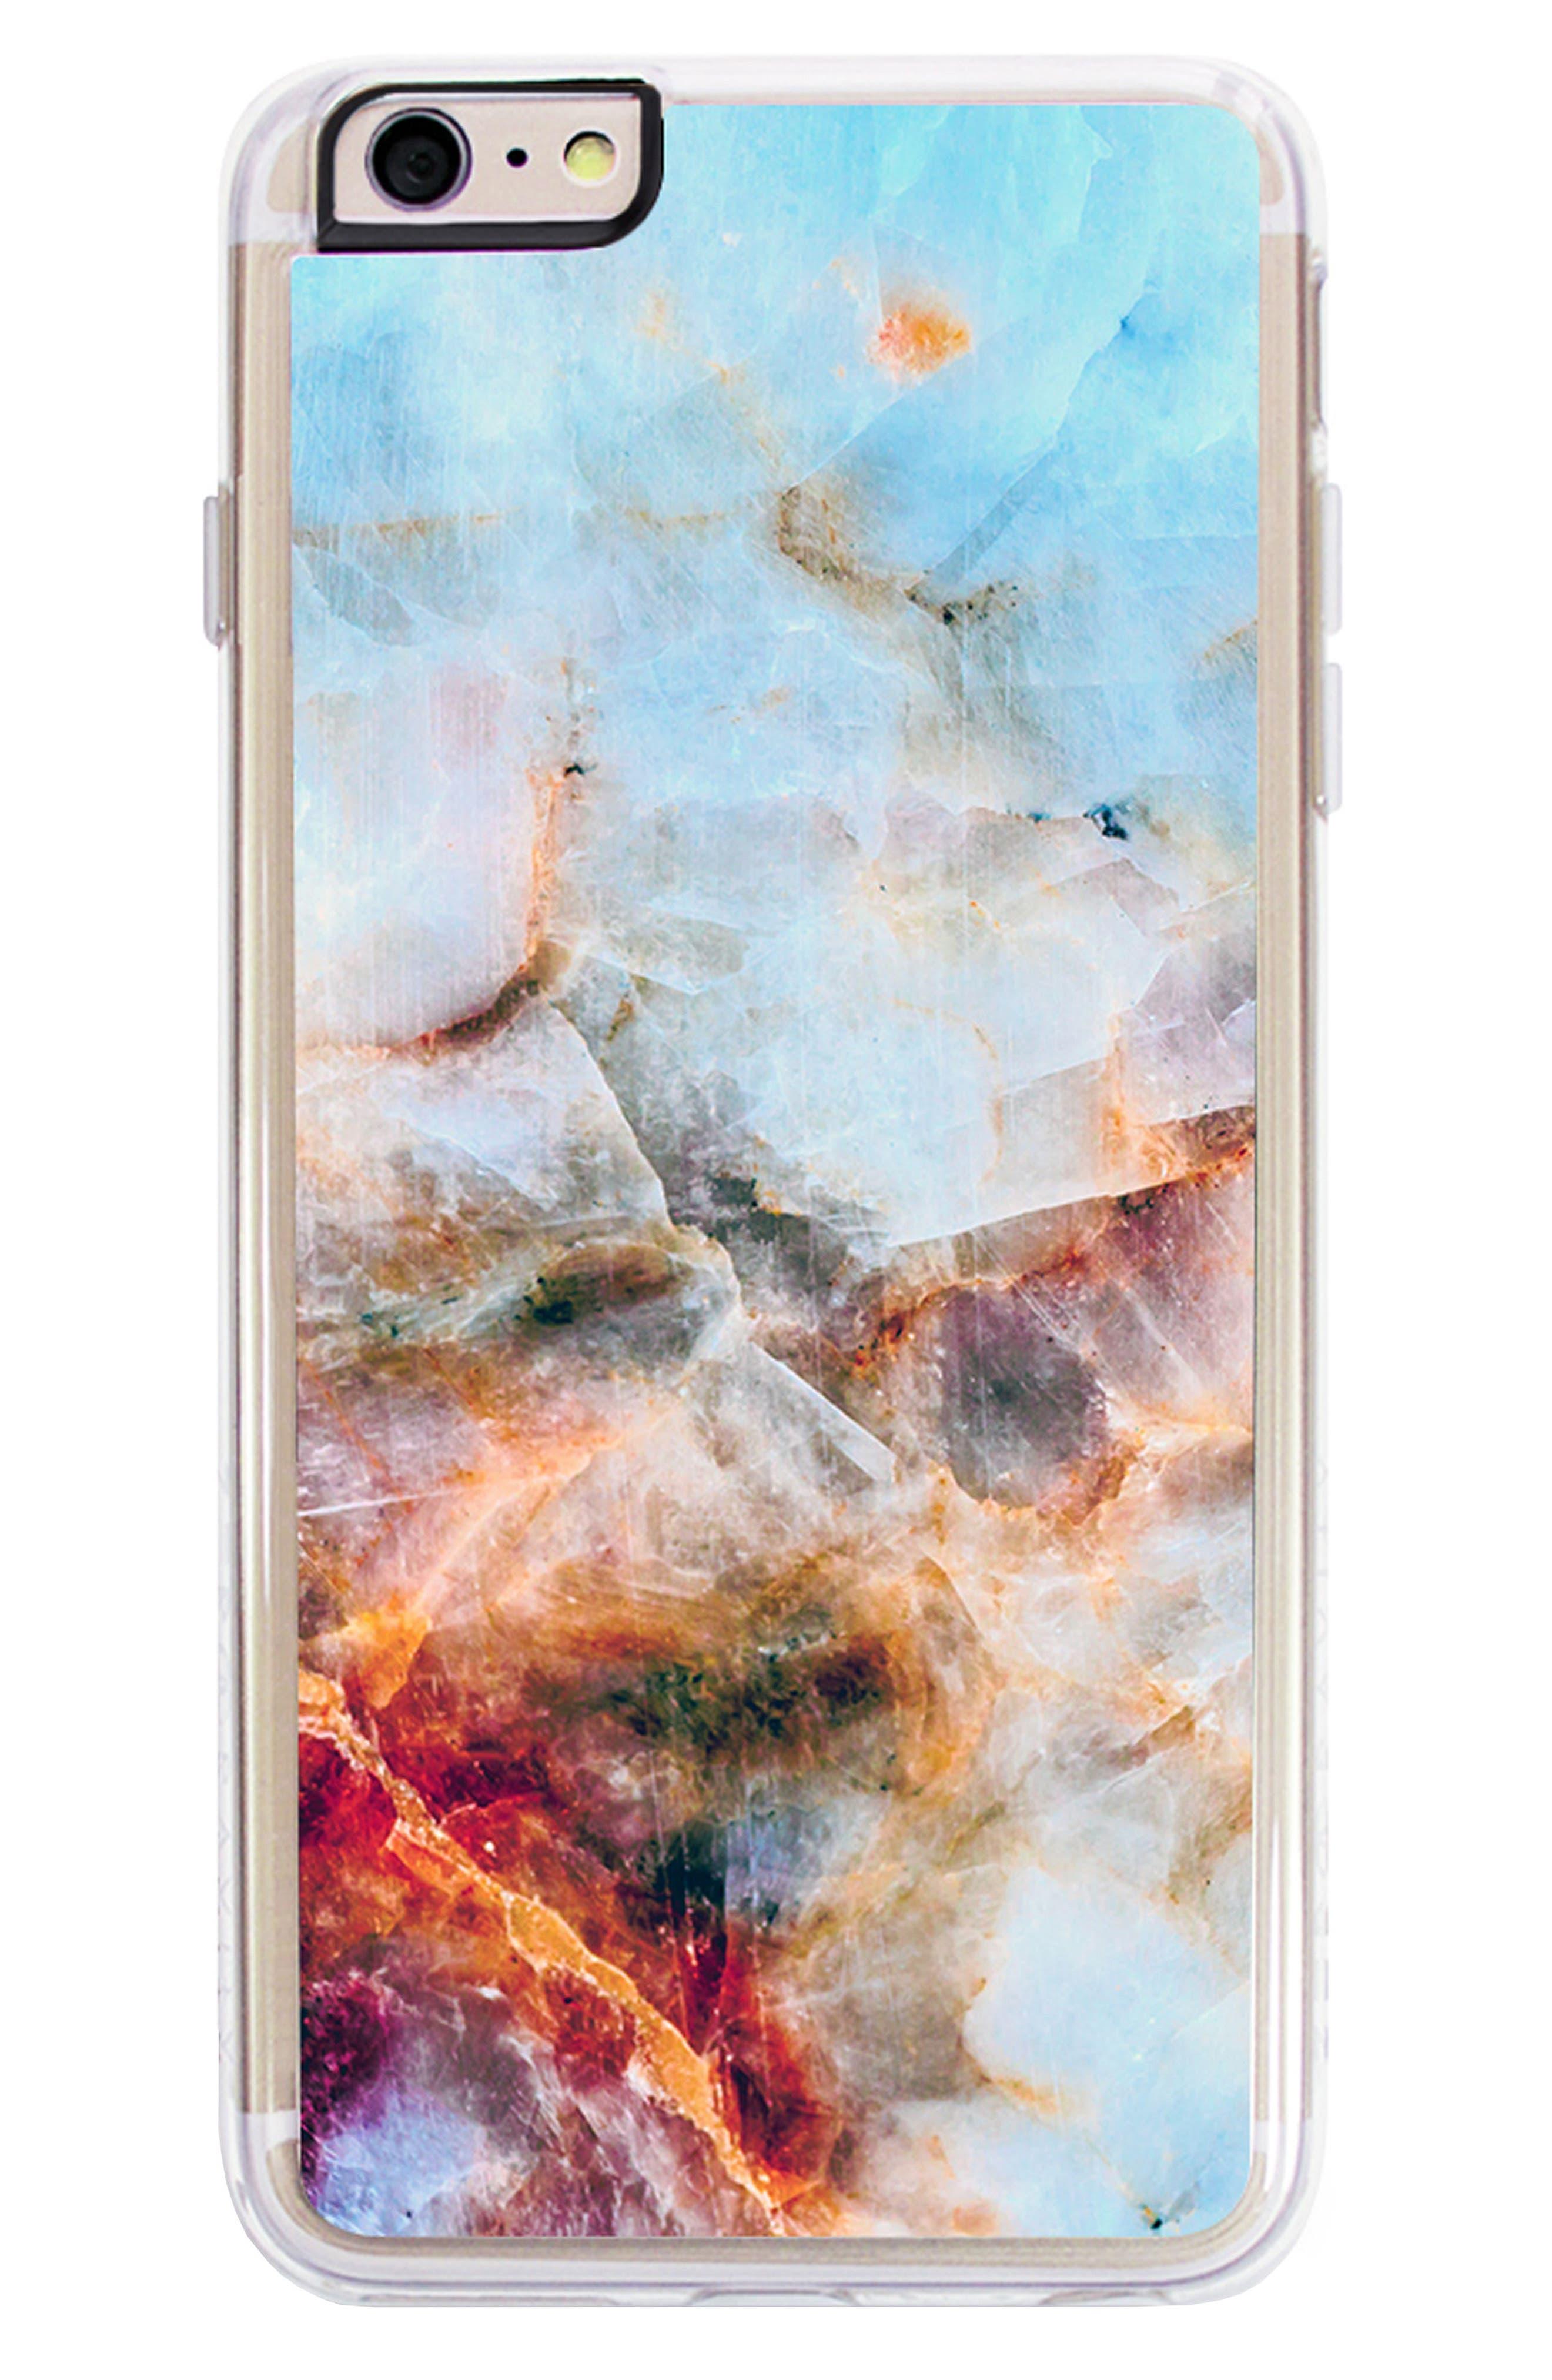 Zero Gravity Radia iPhone 6/7 & 6/7 Plus Case